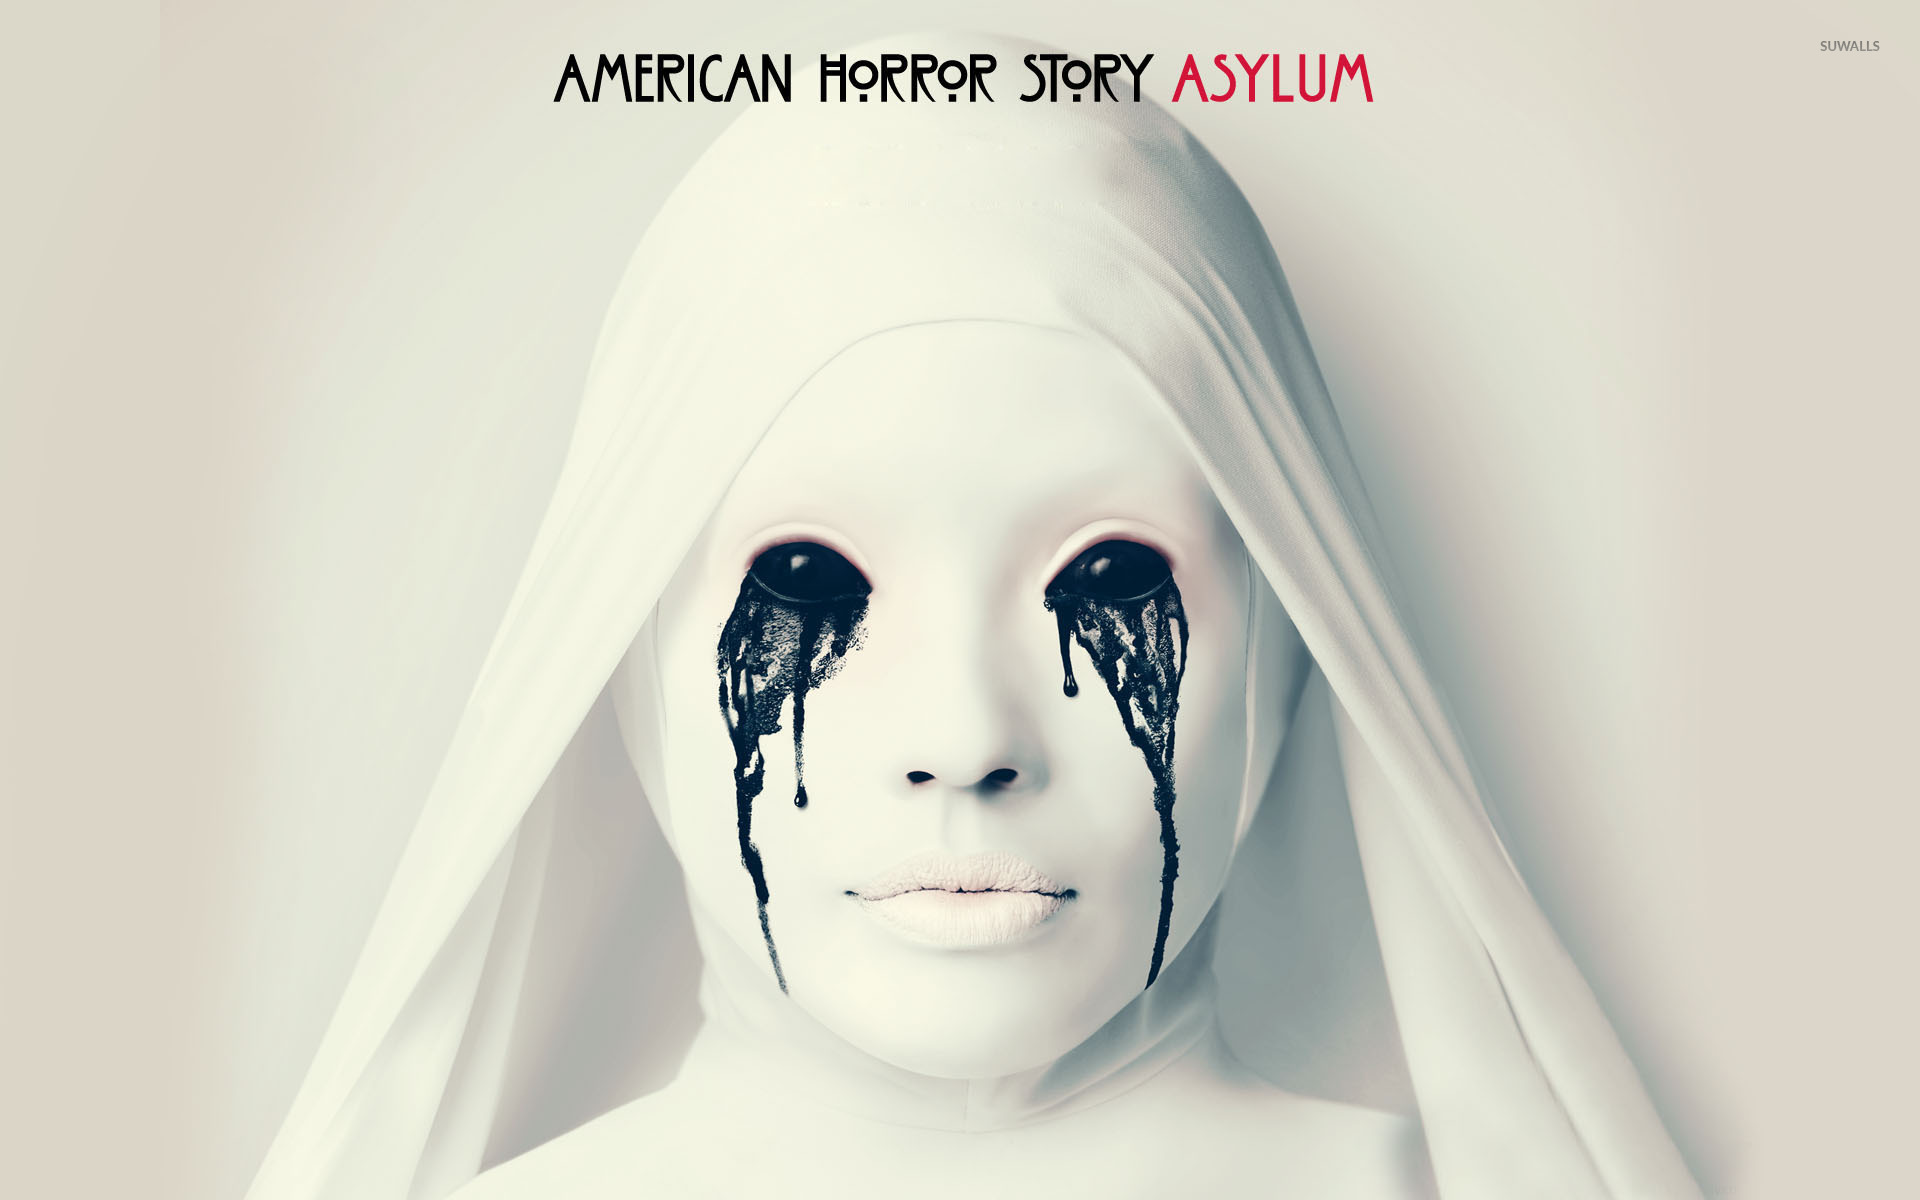 American Horror Story Asylum Wallpaper Tv Show Wallpapers 27970